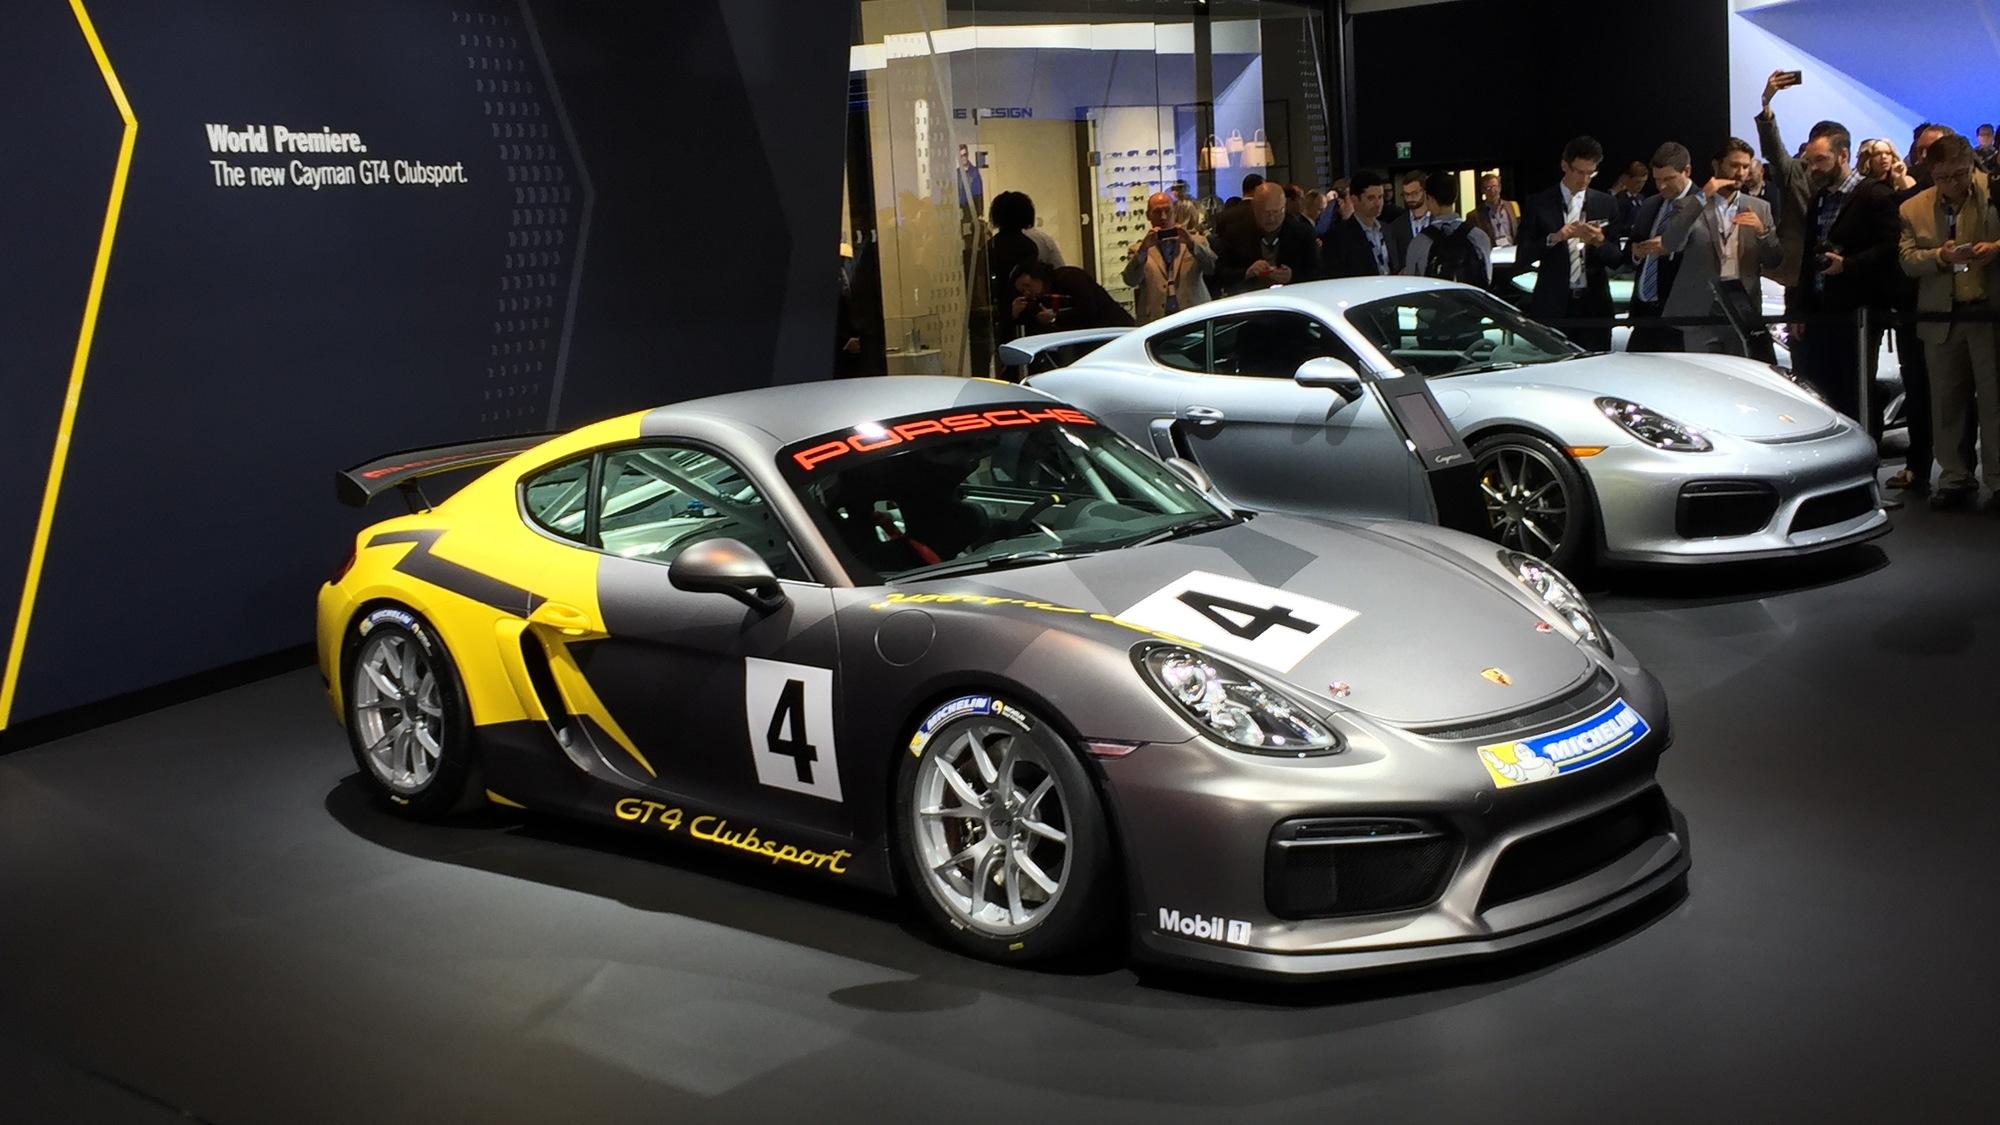 Porsche Cayman GT4 Clubsport, 2015 Los Angeles Auto Show